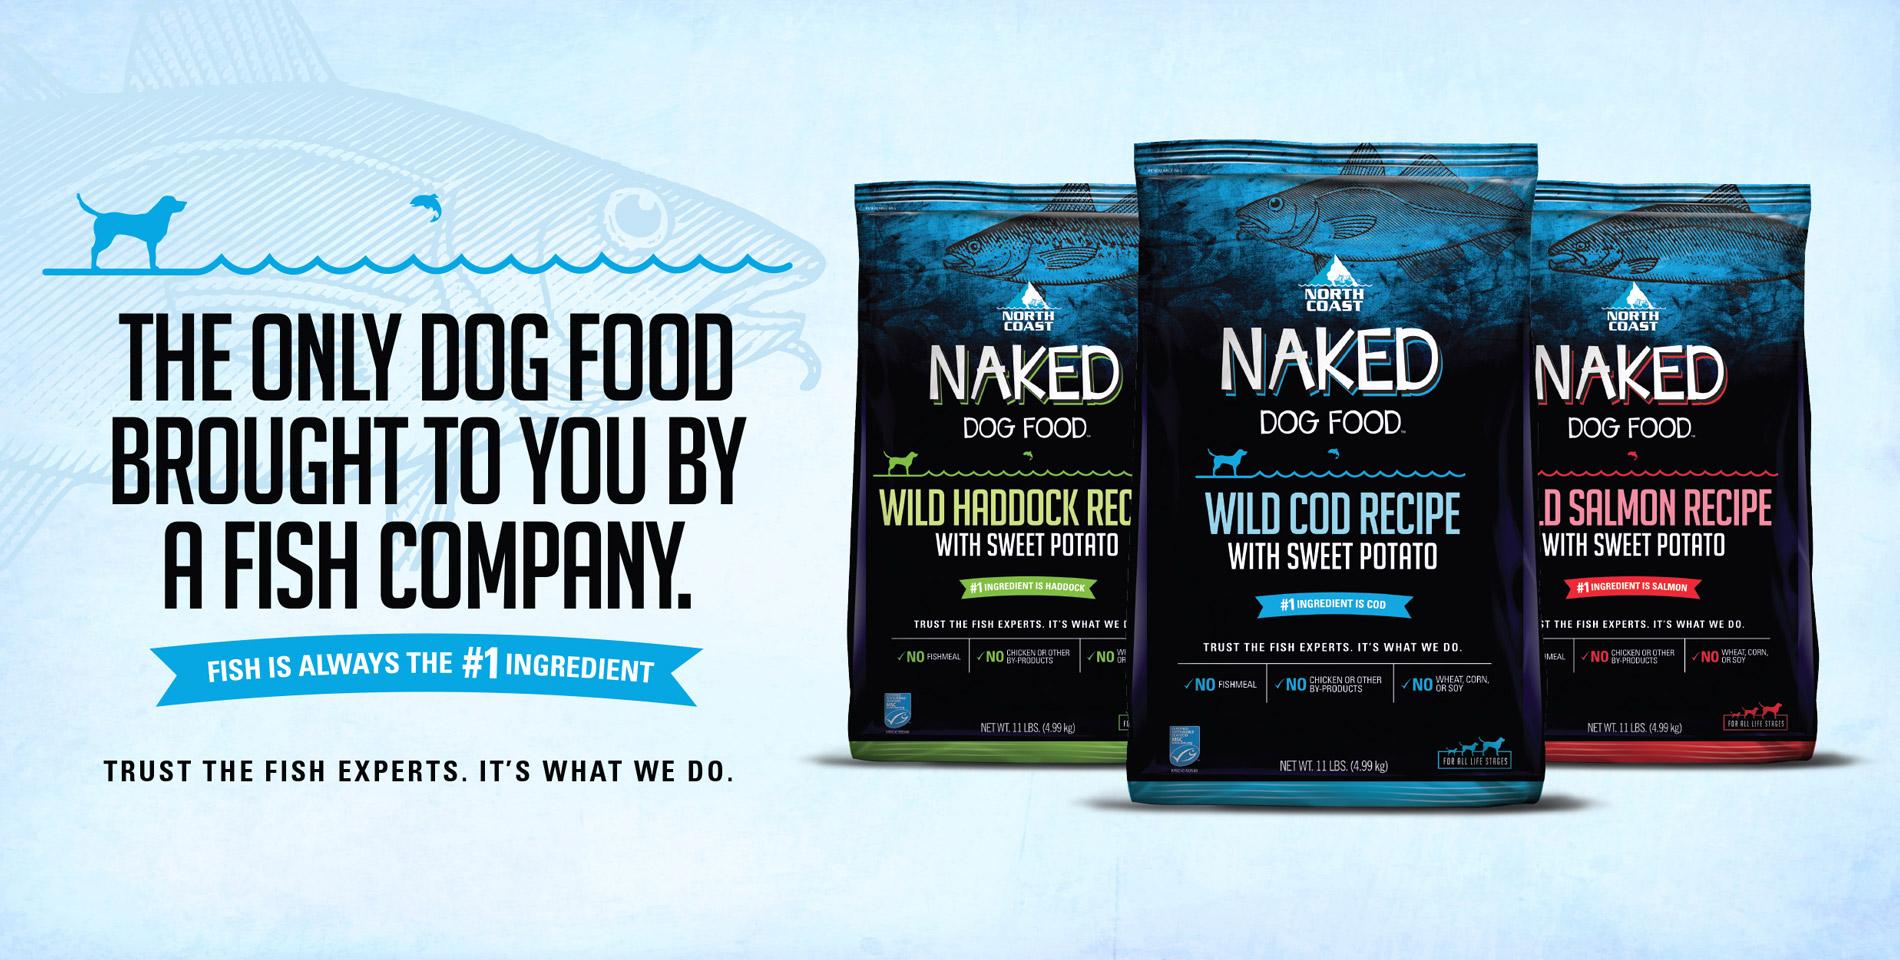 North Coast Naked Dog Food